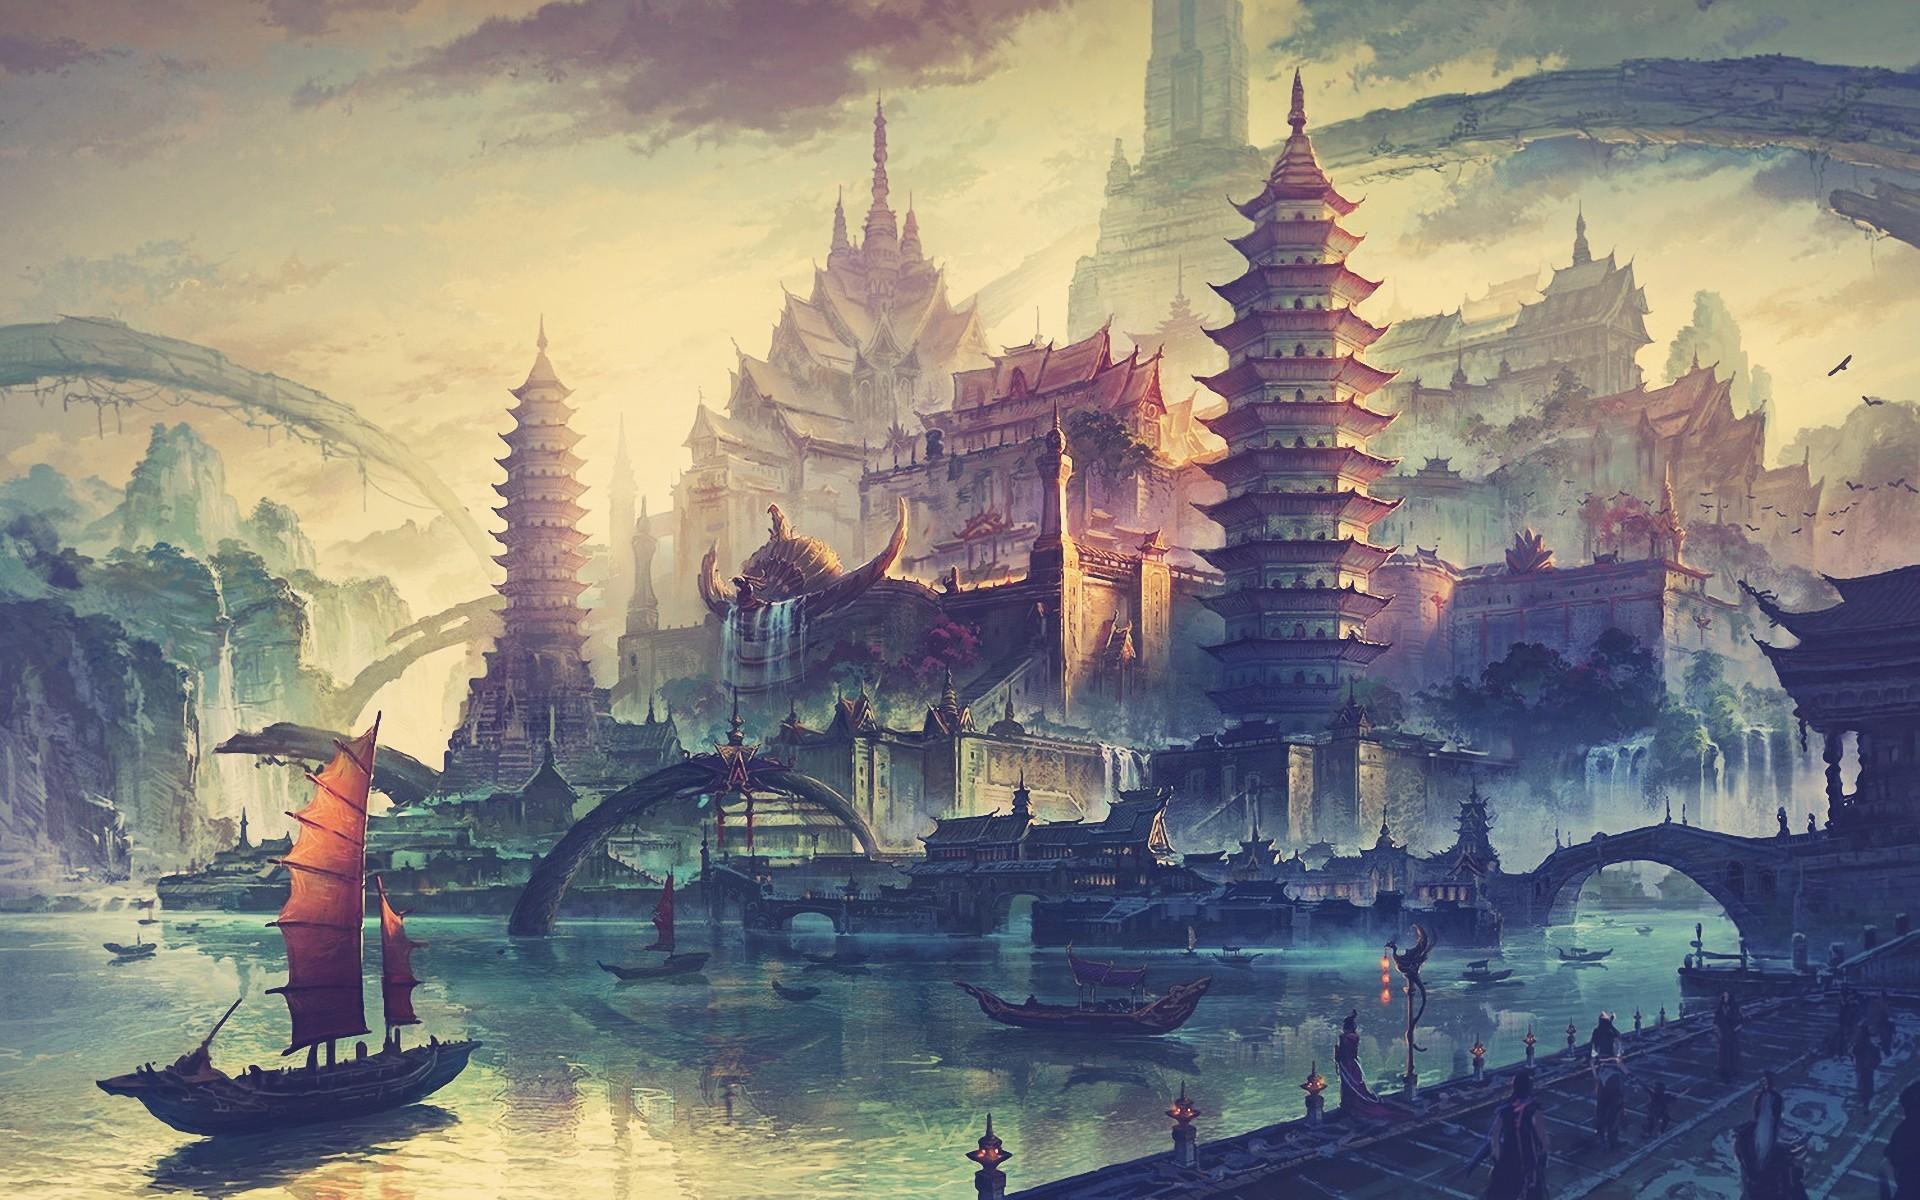 Painting Illustration Boat Fantasy Art Cityscape Asian Architecture Artwork City Evening Tower Landmark Screenshot Watercolor